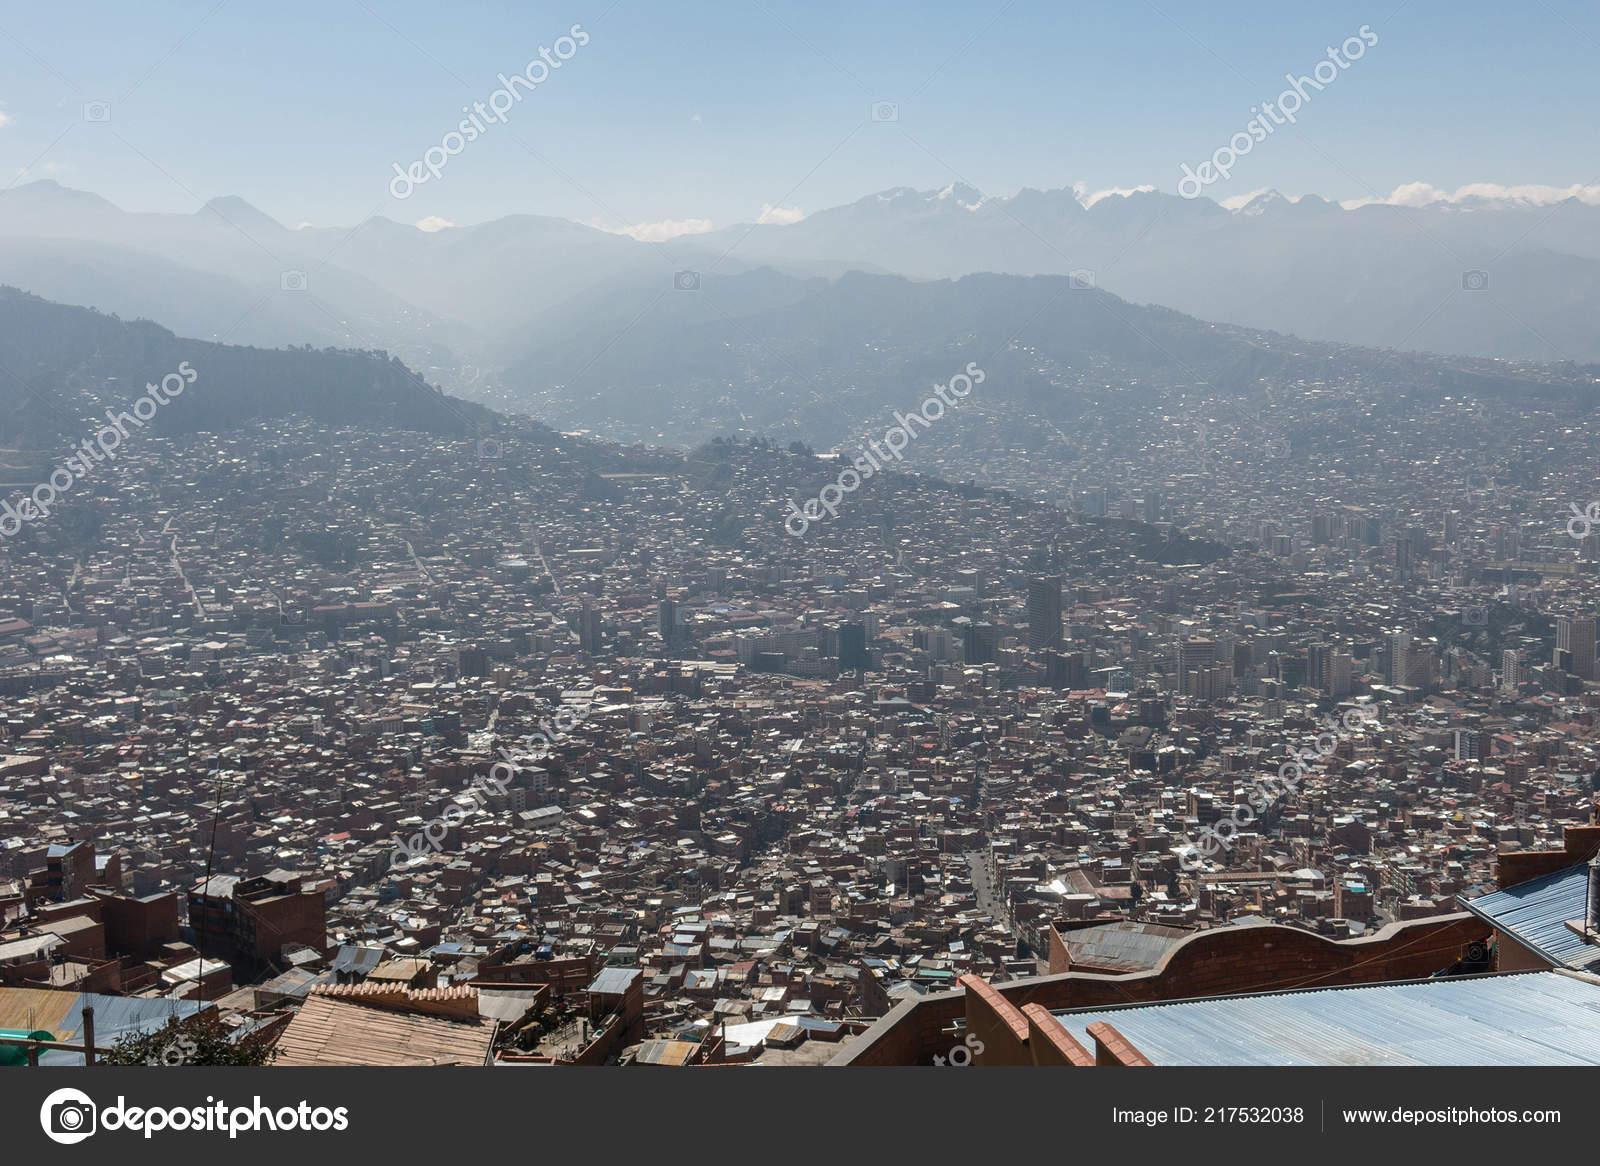 City Paz High Andes Mountains Bolivia Viewed Mirador Kilikili Background Stock Photo C Toniflap 217532038